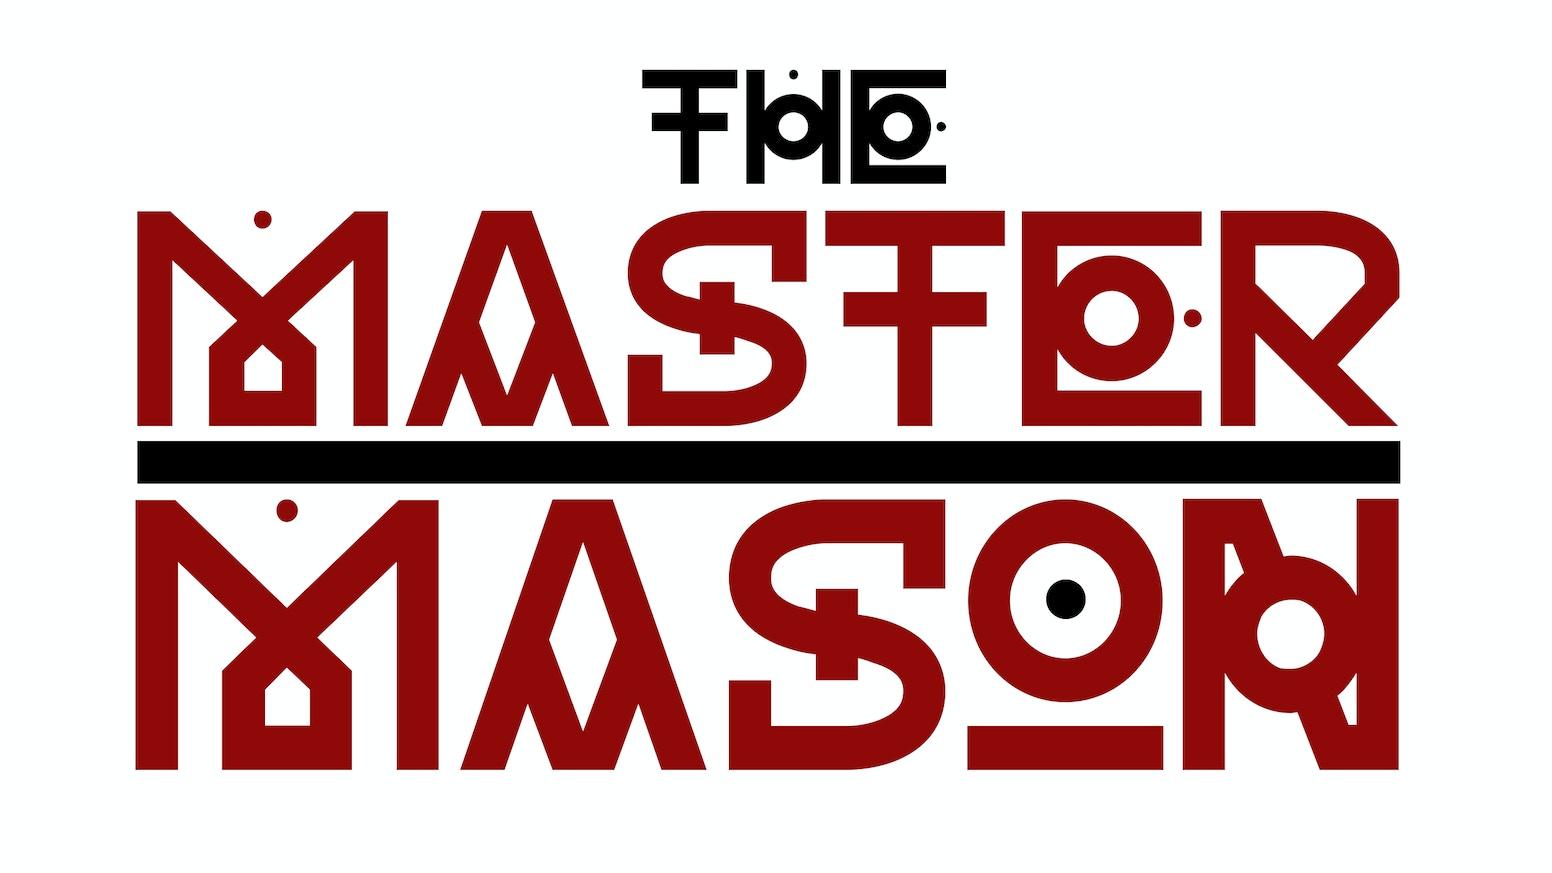 The Master Mason Book The Third Degree Of Freemasonry By Greg